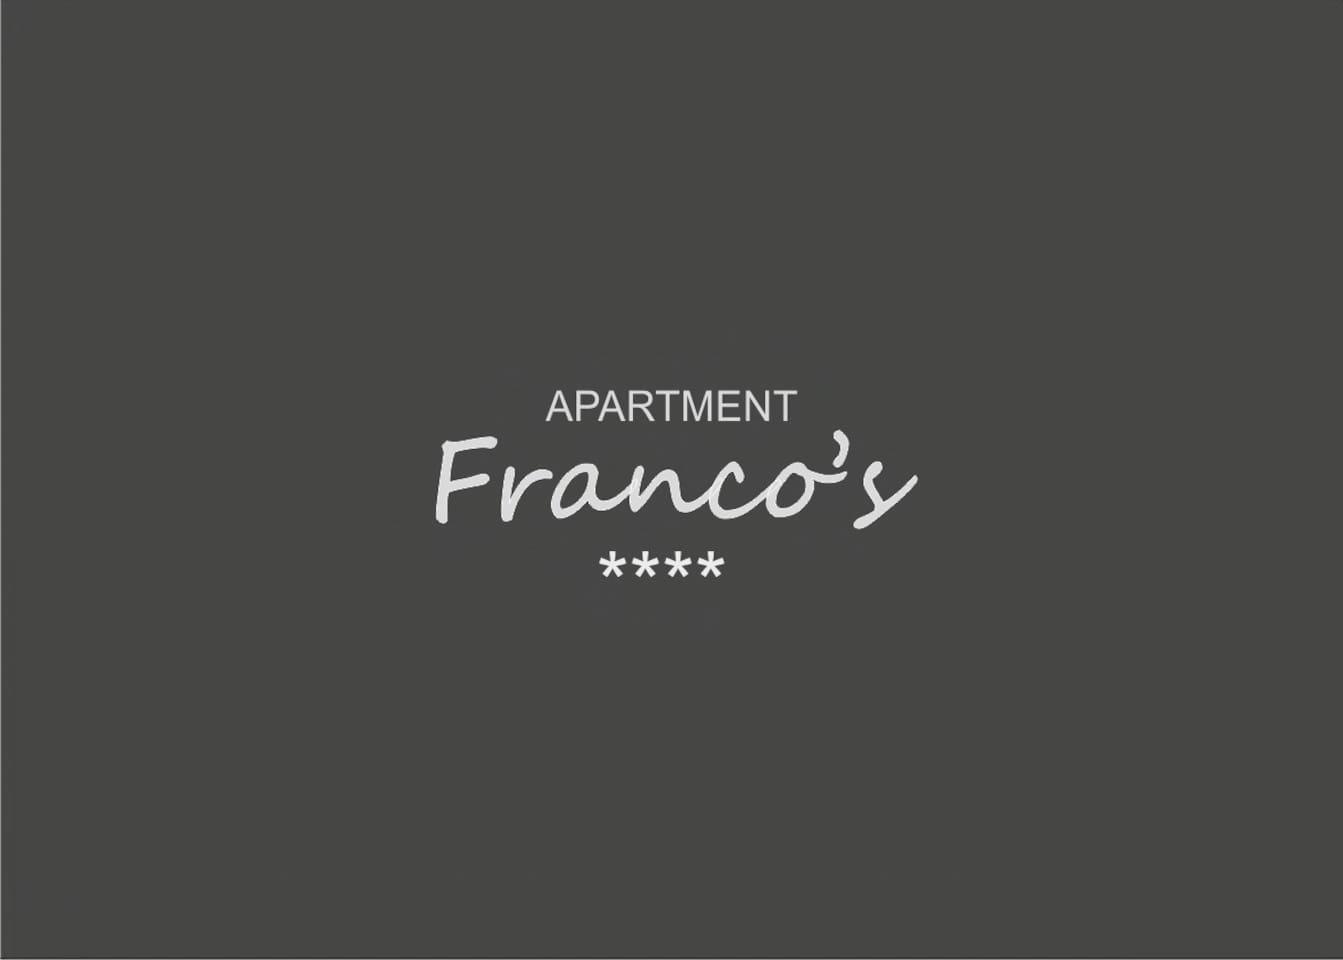 Apartment Francos